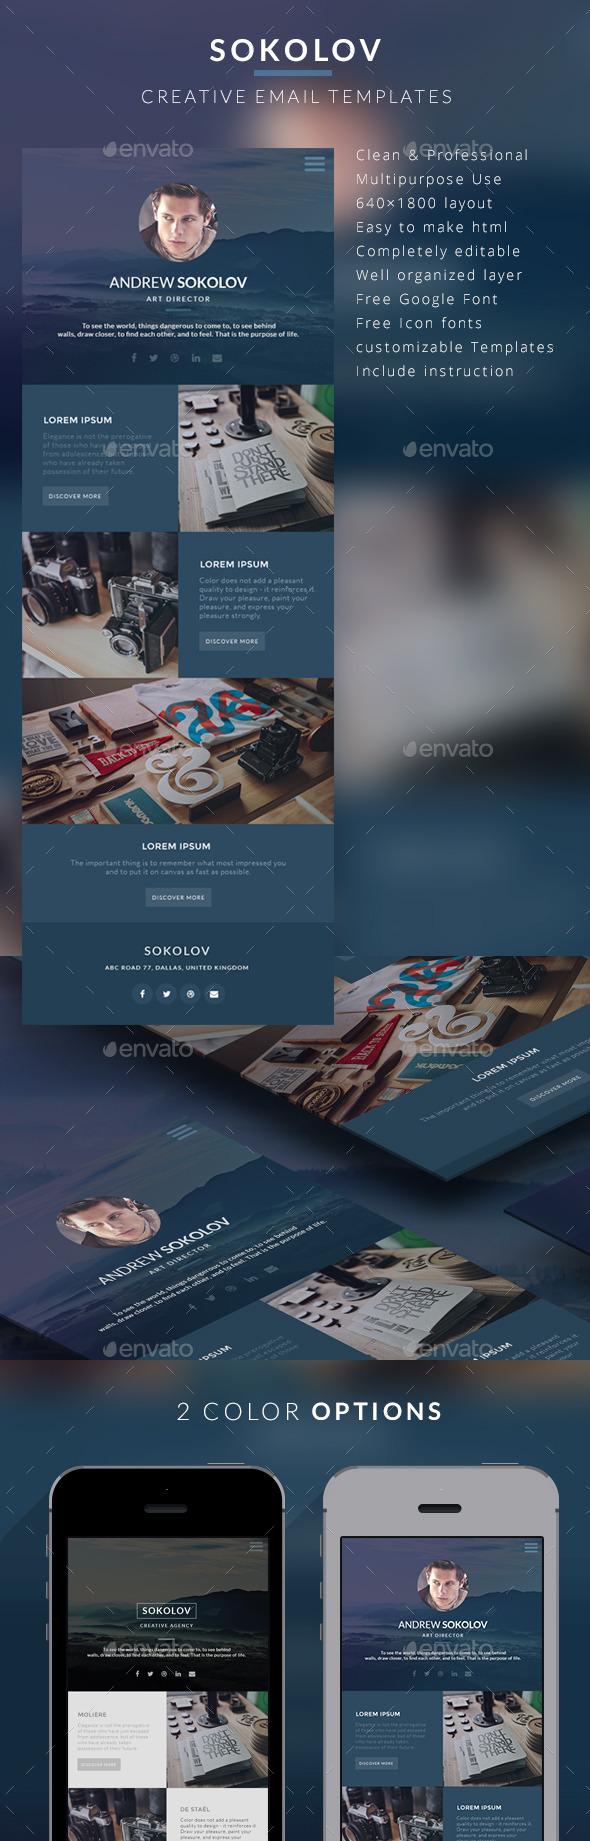 Creative Email Templates - Sokolov - E-newsletters Web Elements